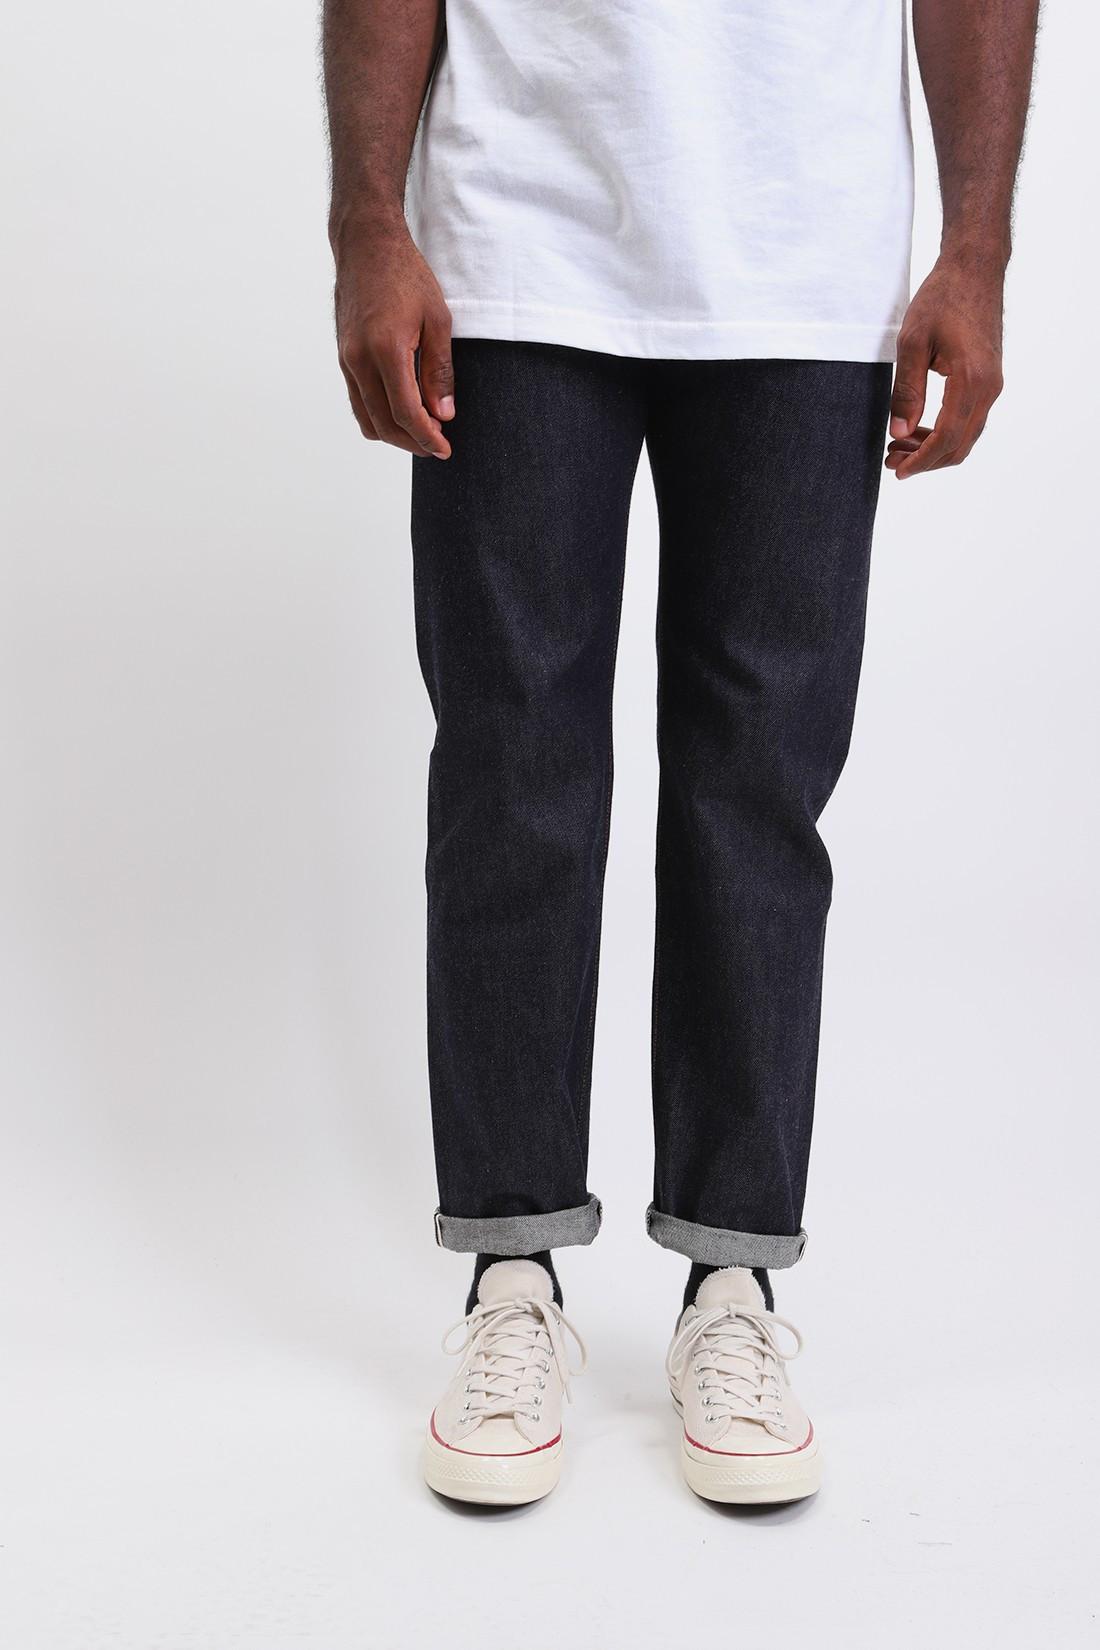 LEVI'S ® VINTAGE CLOTHING / 1954 501 jeans rigid C7835 v2